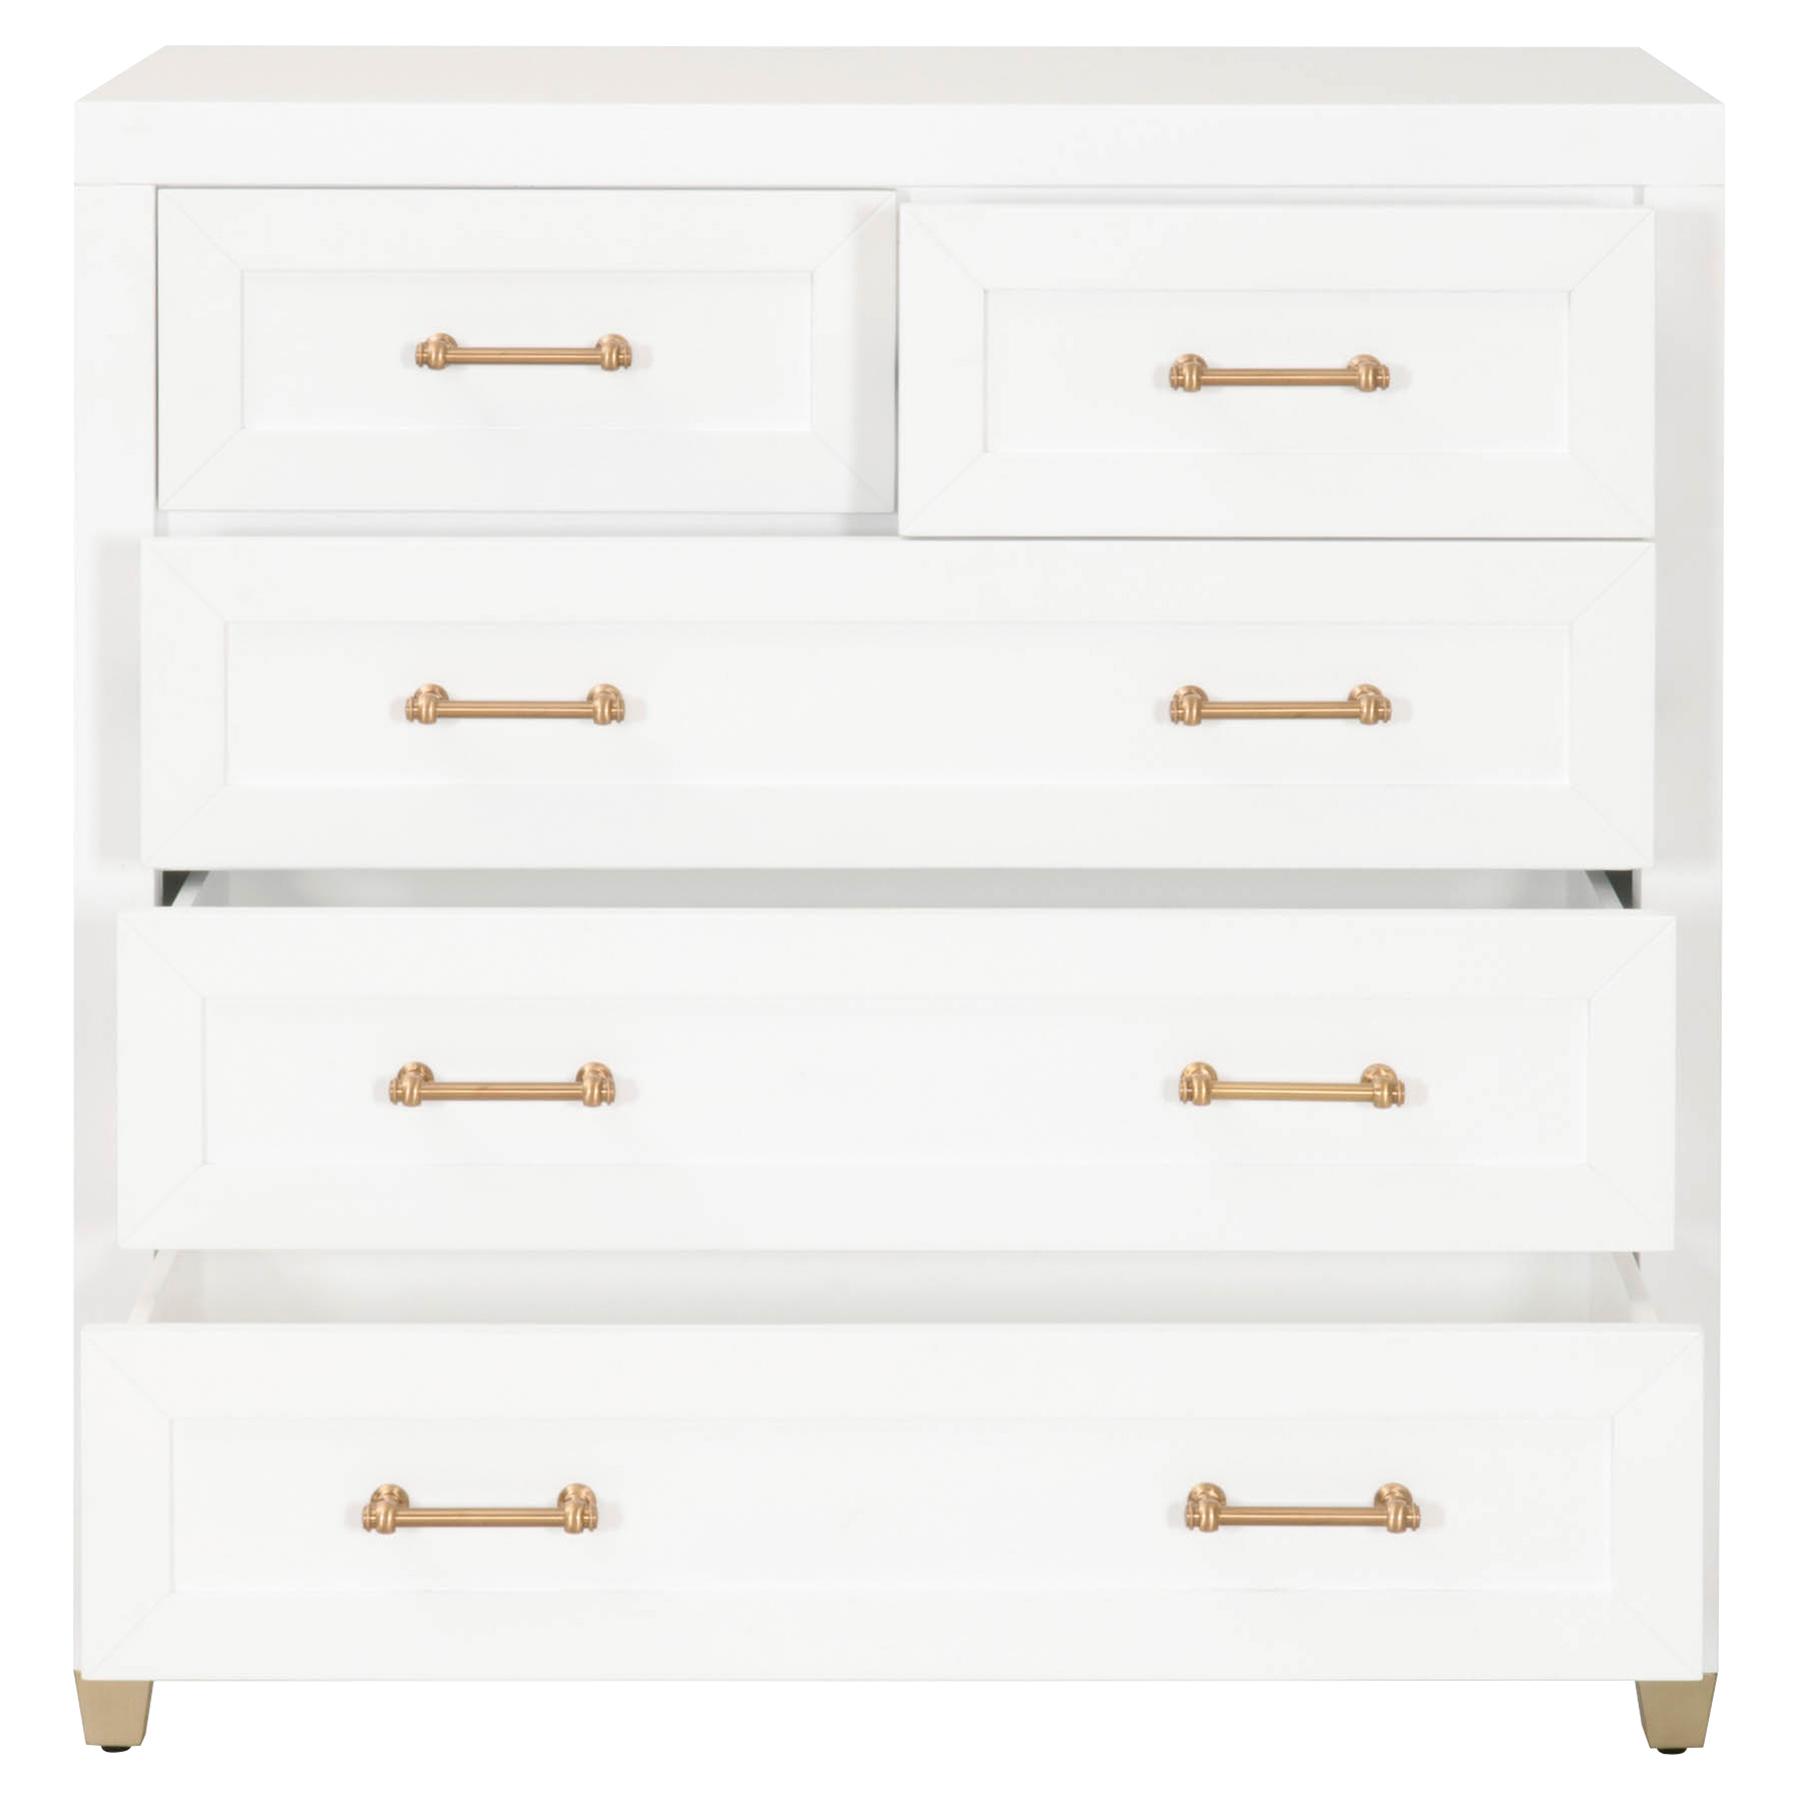 Stacy Modern Classic 5-Drawer Brass Accent White Dresser